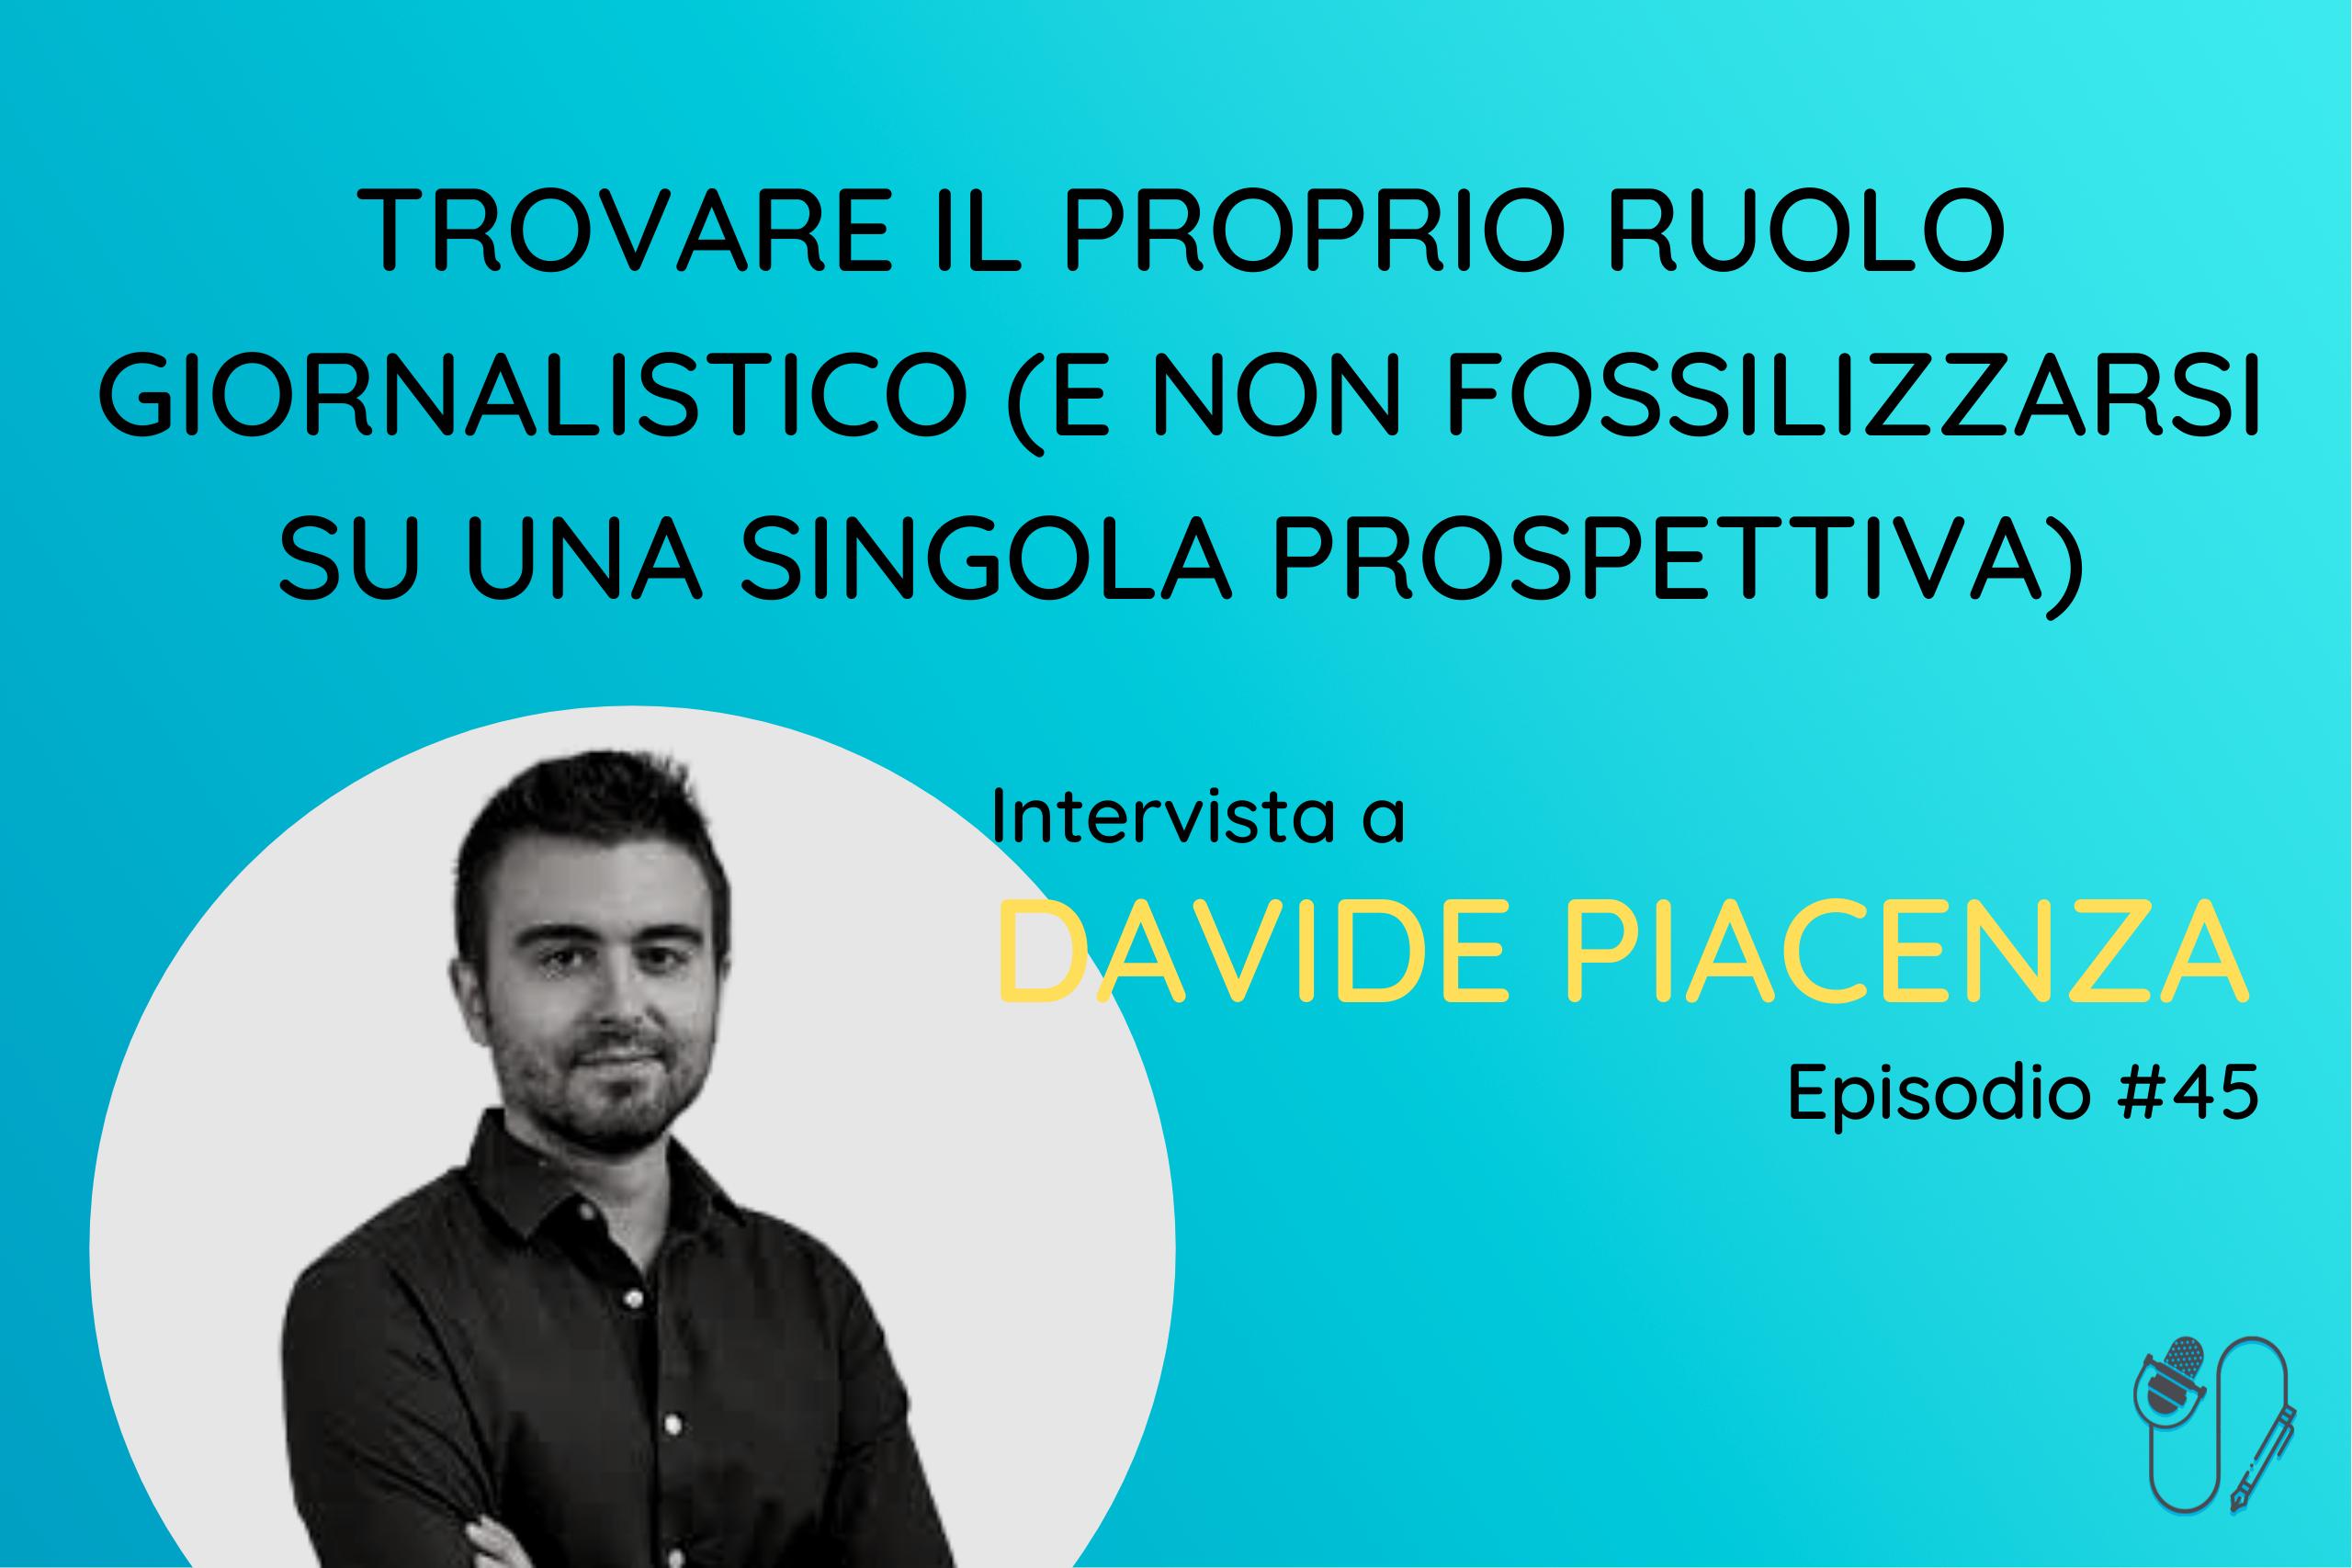 Davide Piacenza